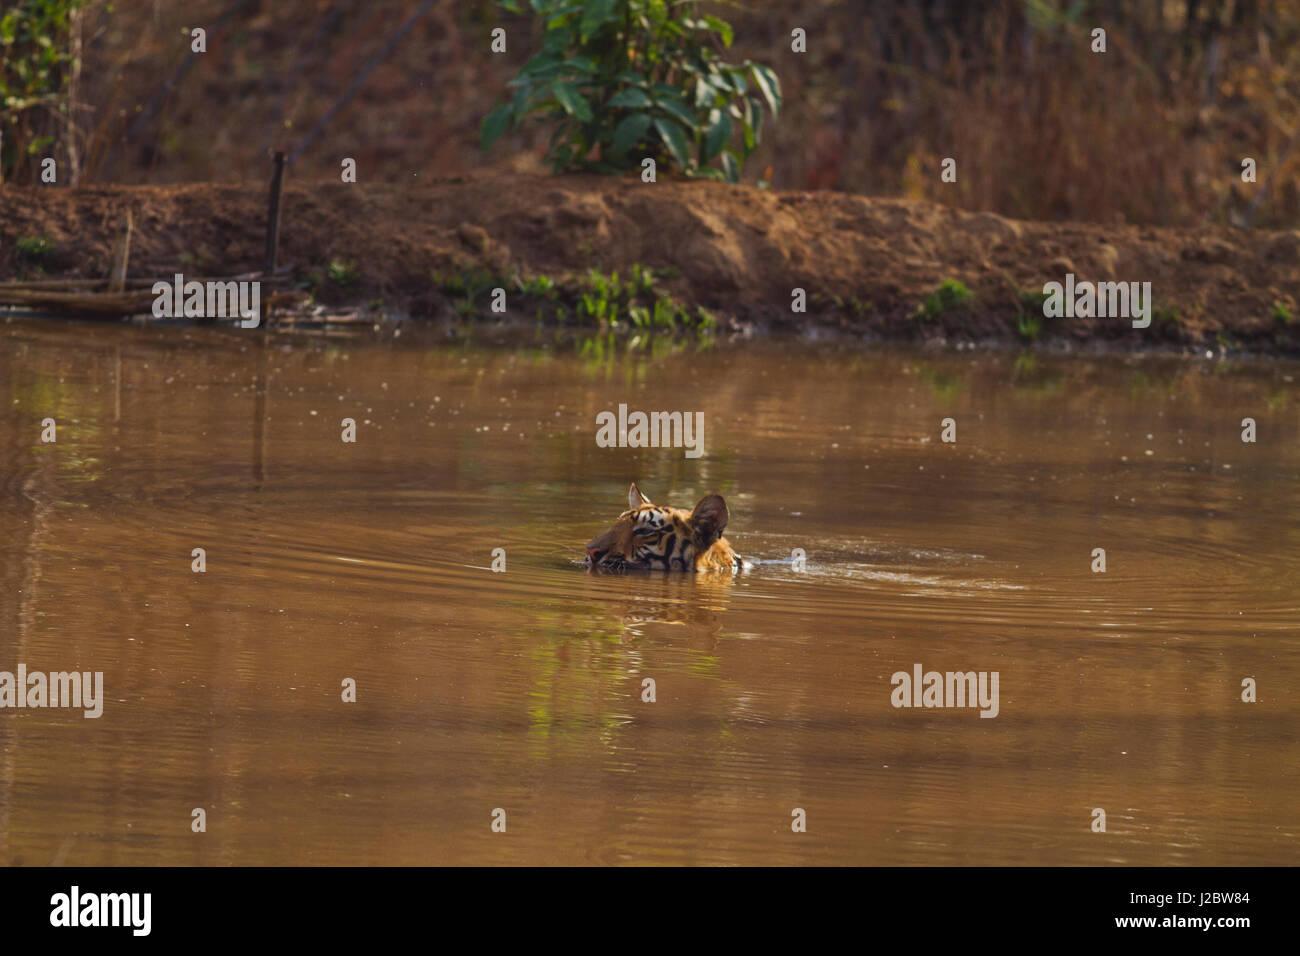 Royal Bengal Tiger, sub-merged in the water, Tadoba Andheri Tiger Reserve, India - Stock Image